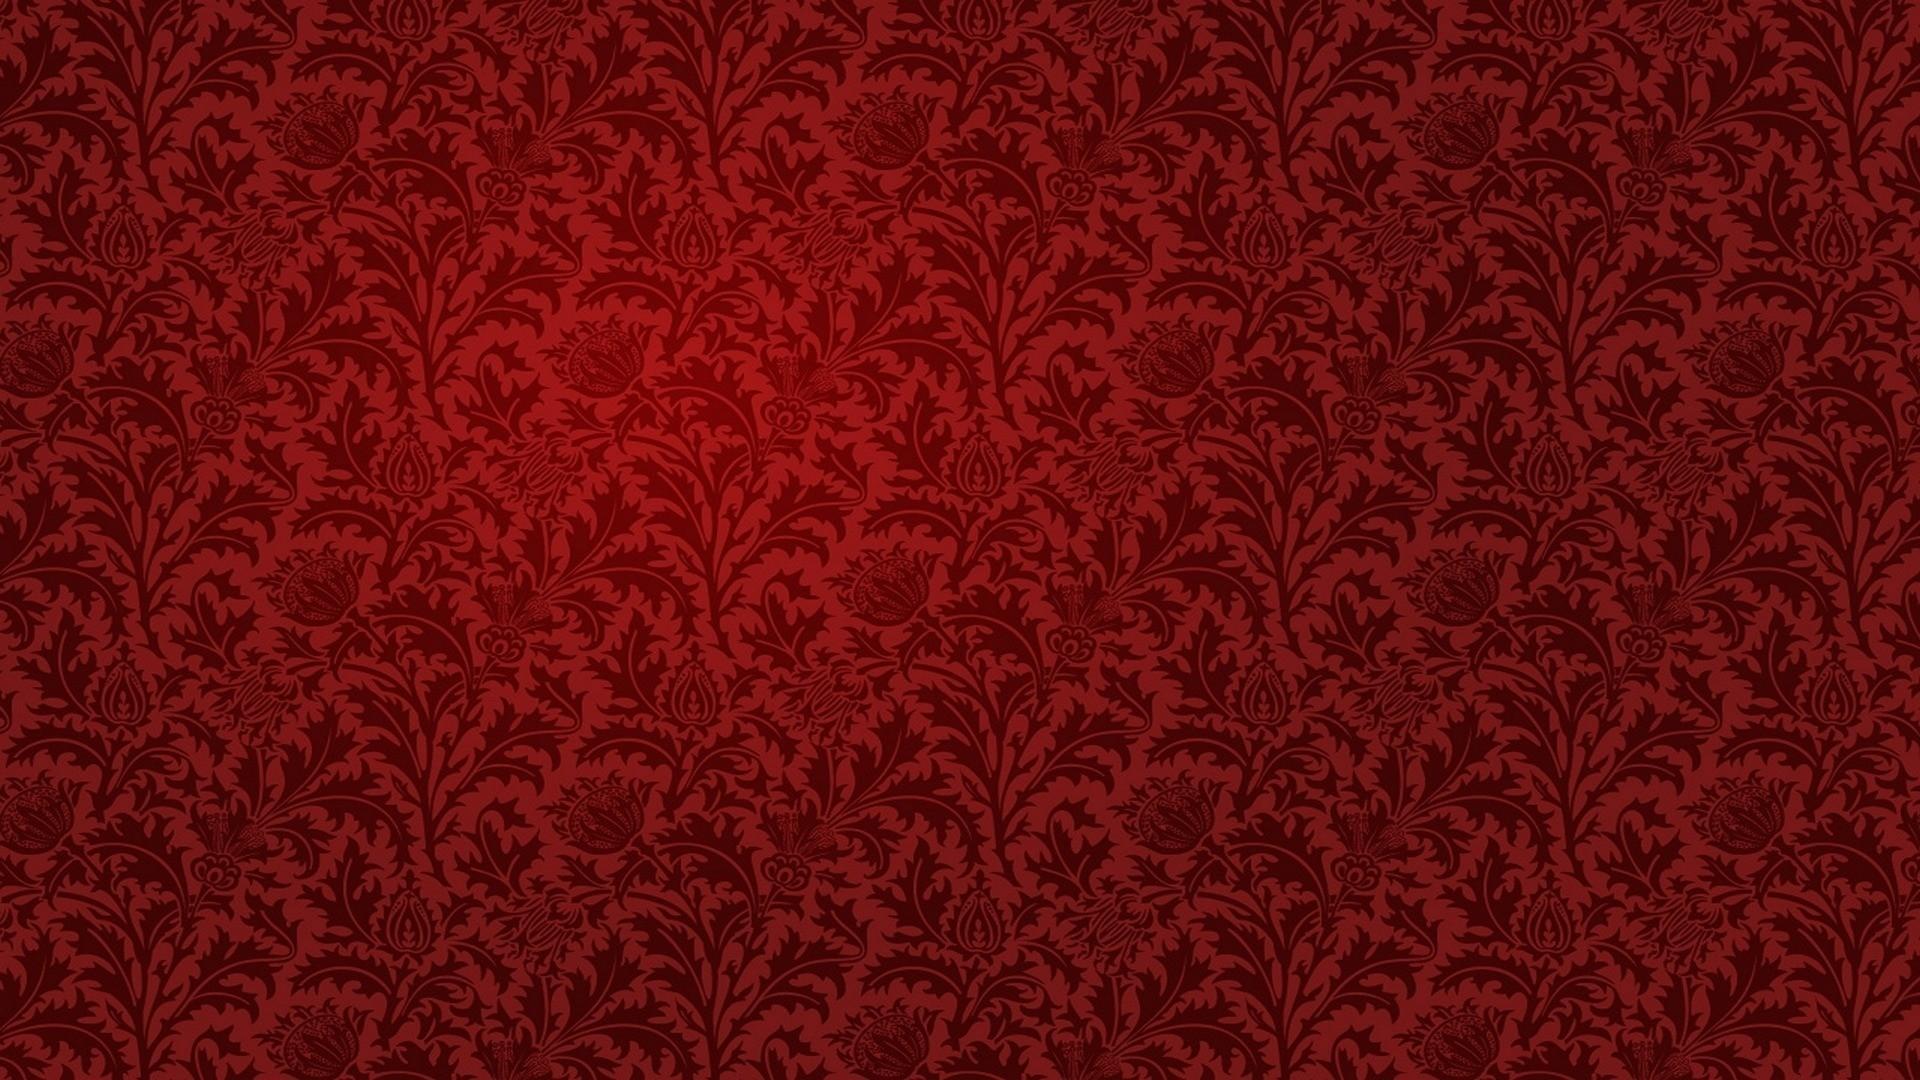 red pattern wallpaper hd 2015   Grasscloth Wallpaper 1920x1080